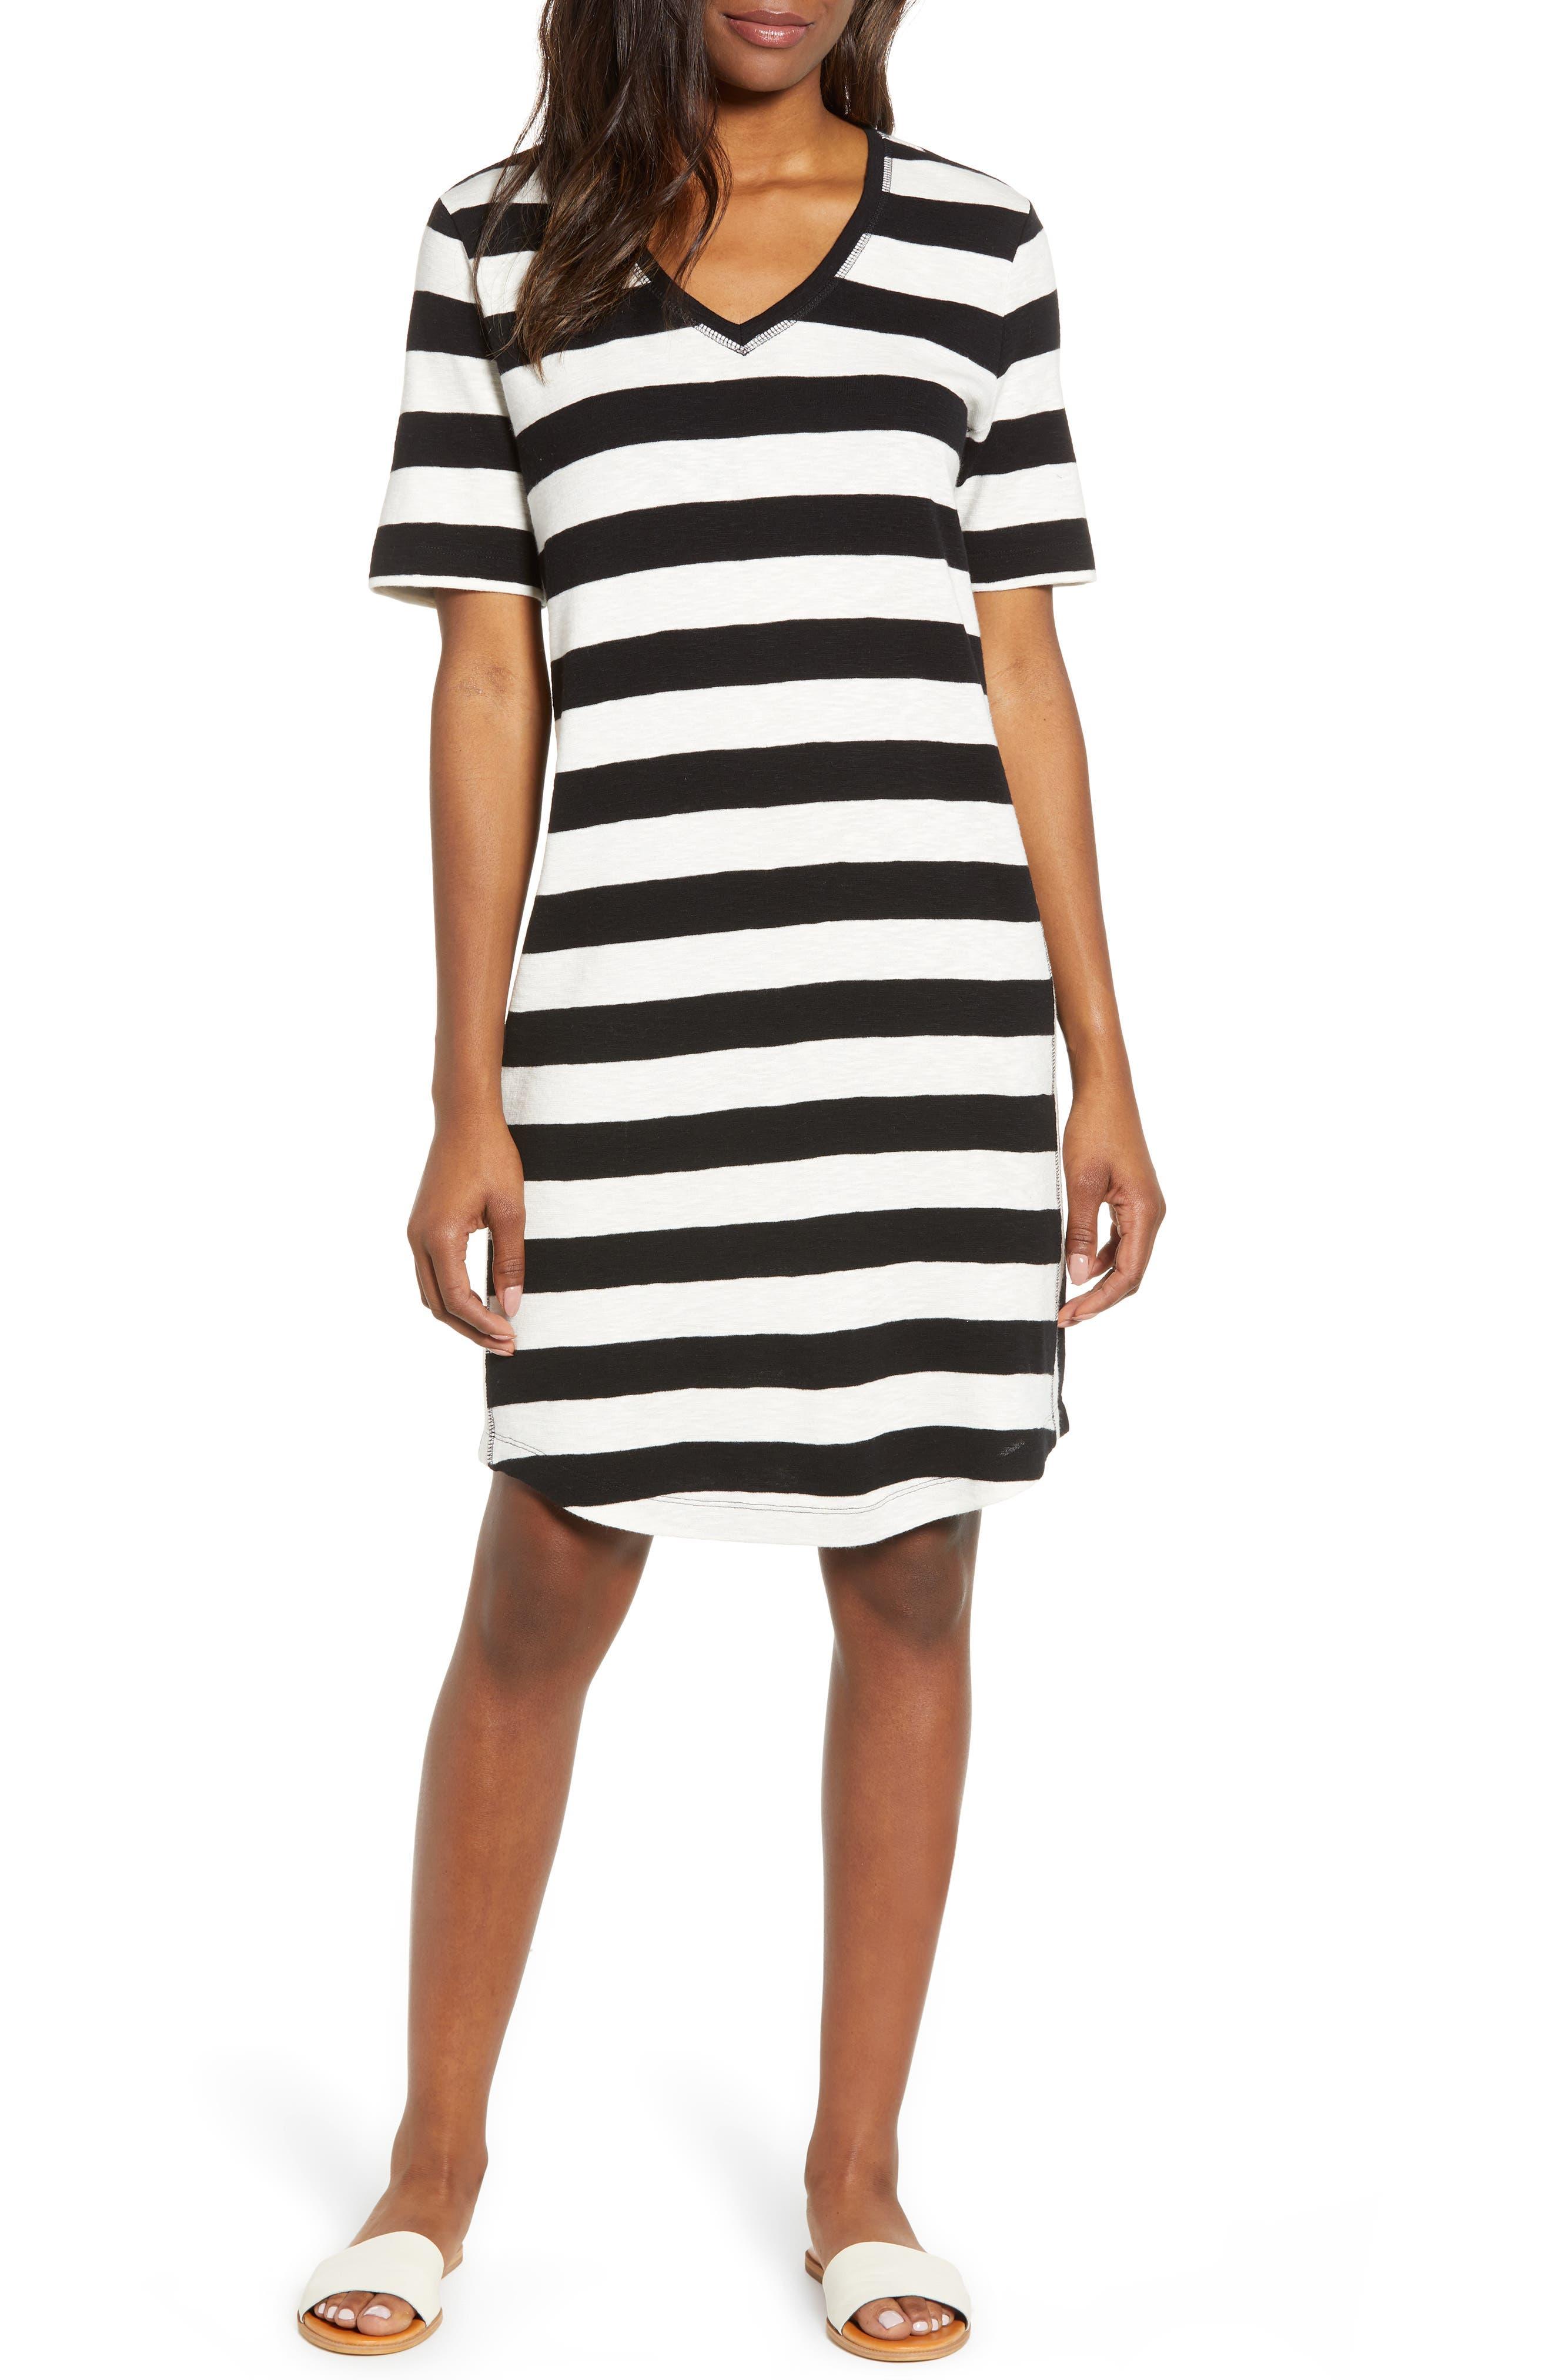 Petite Caslon Slub Knit Dress, Black